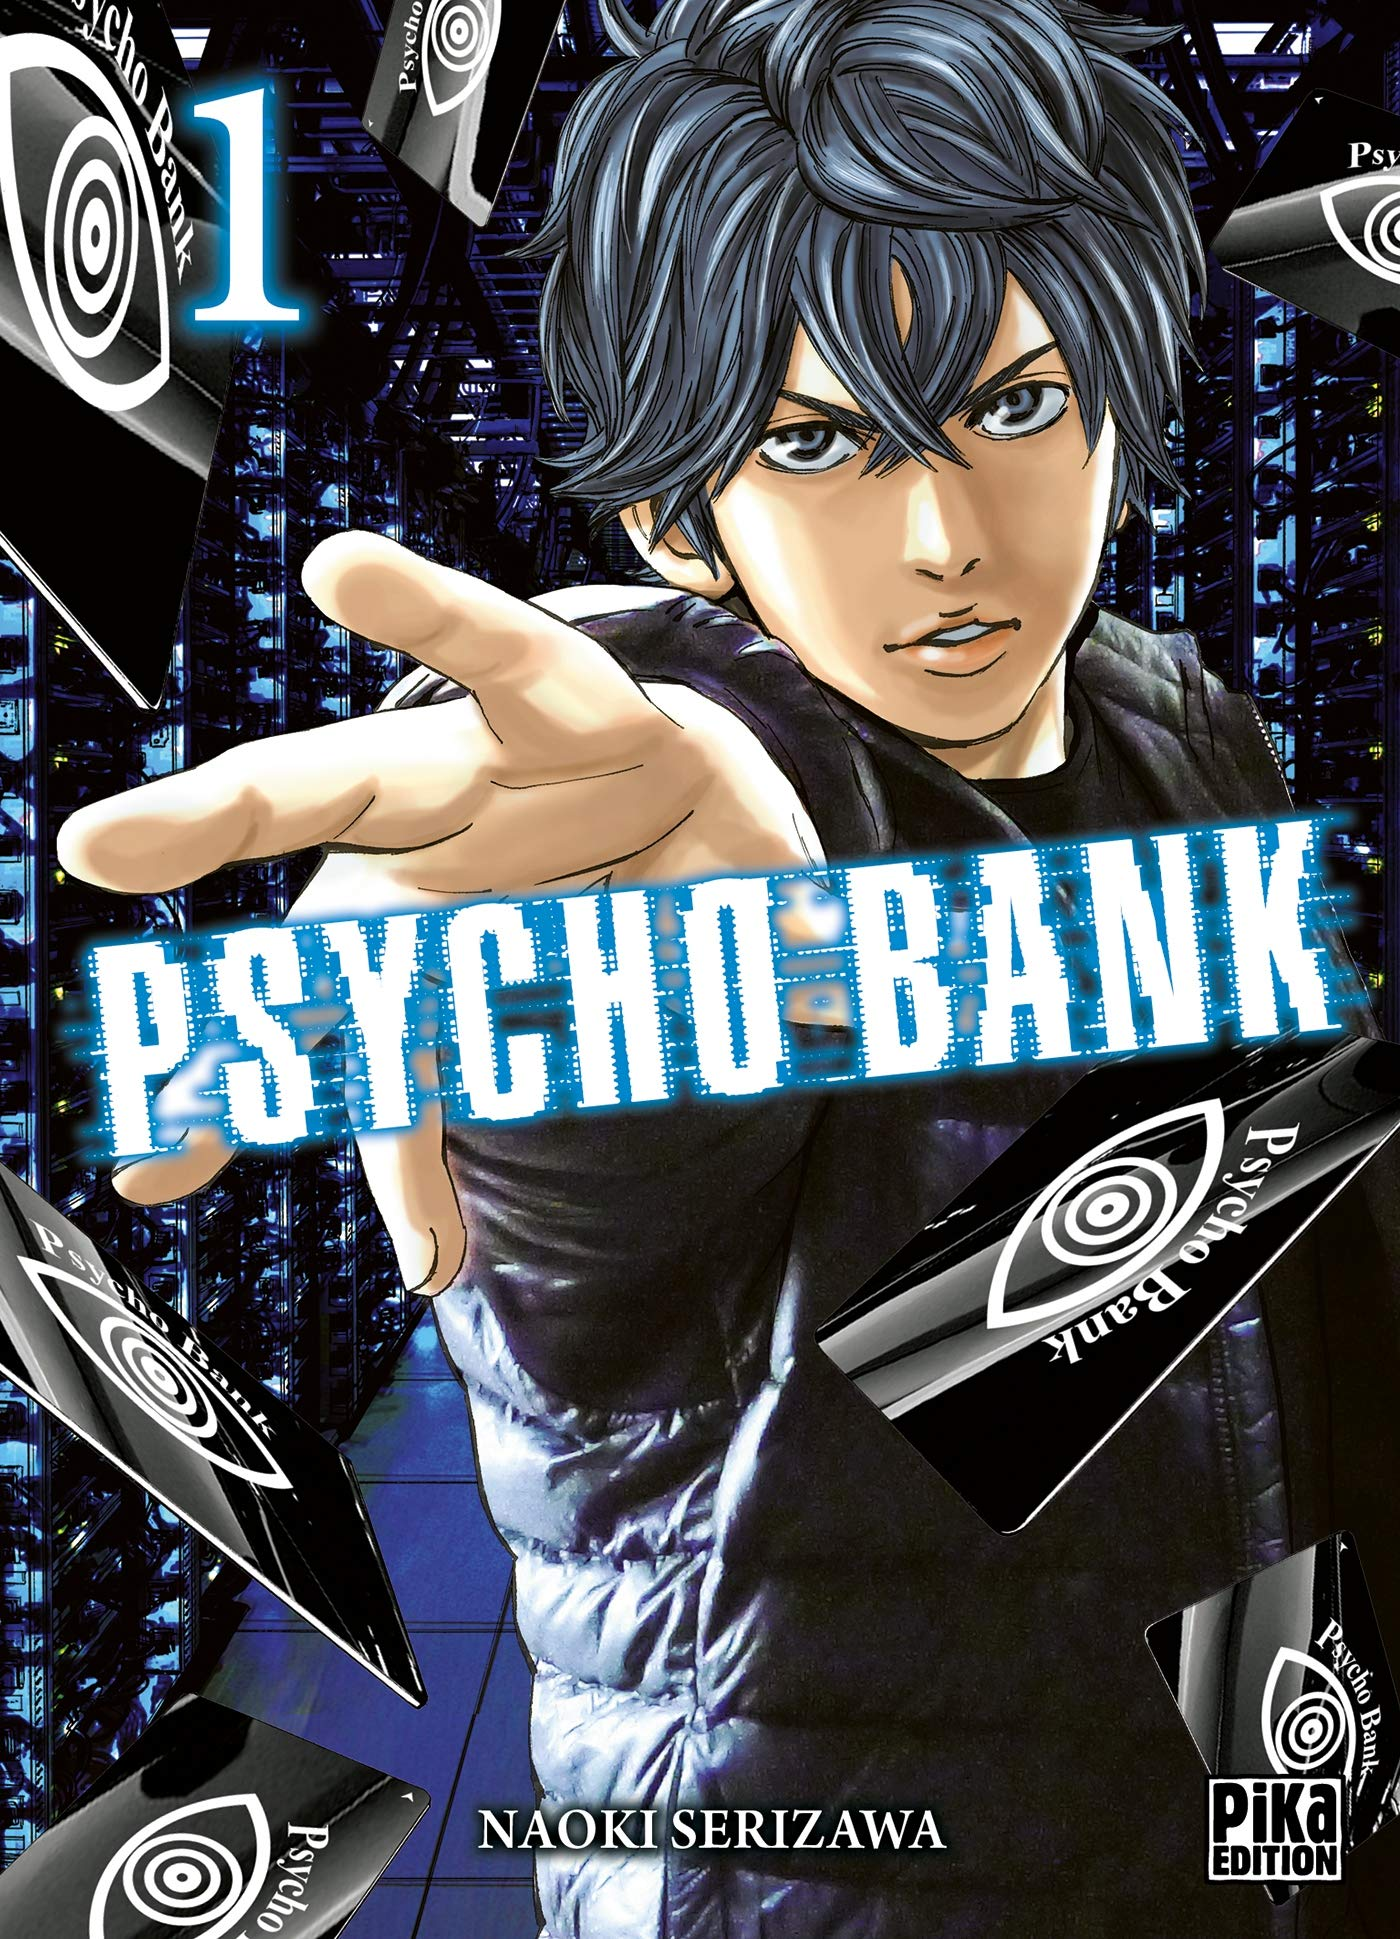 Psycho bank 1